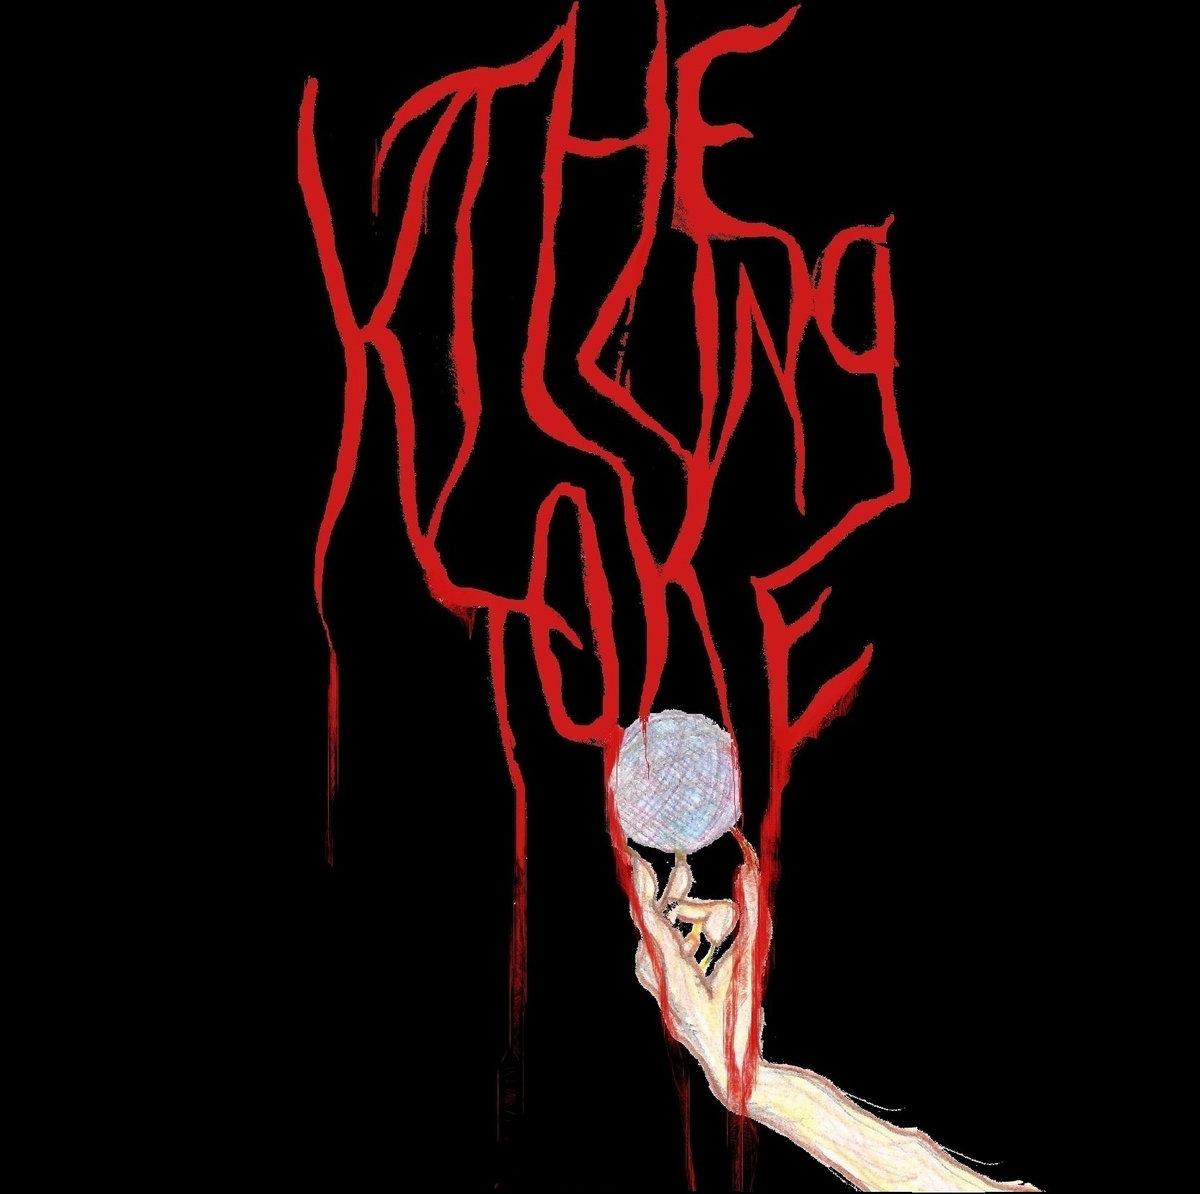 Music | The Killing Toke